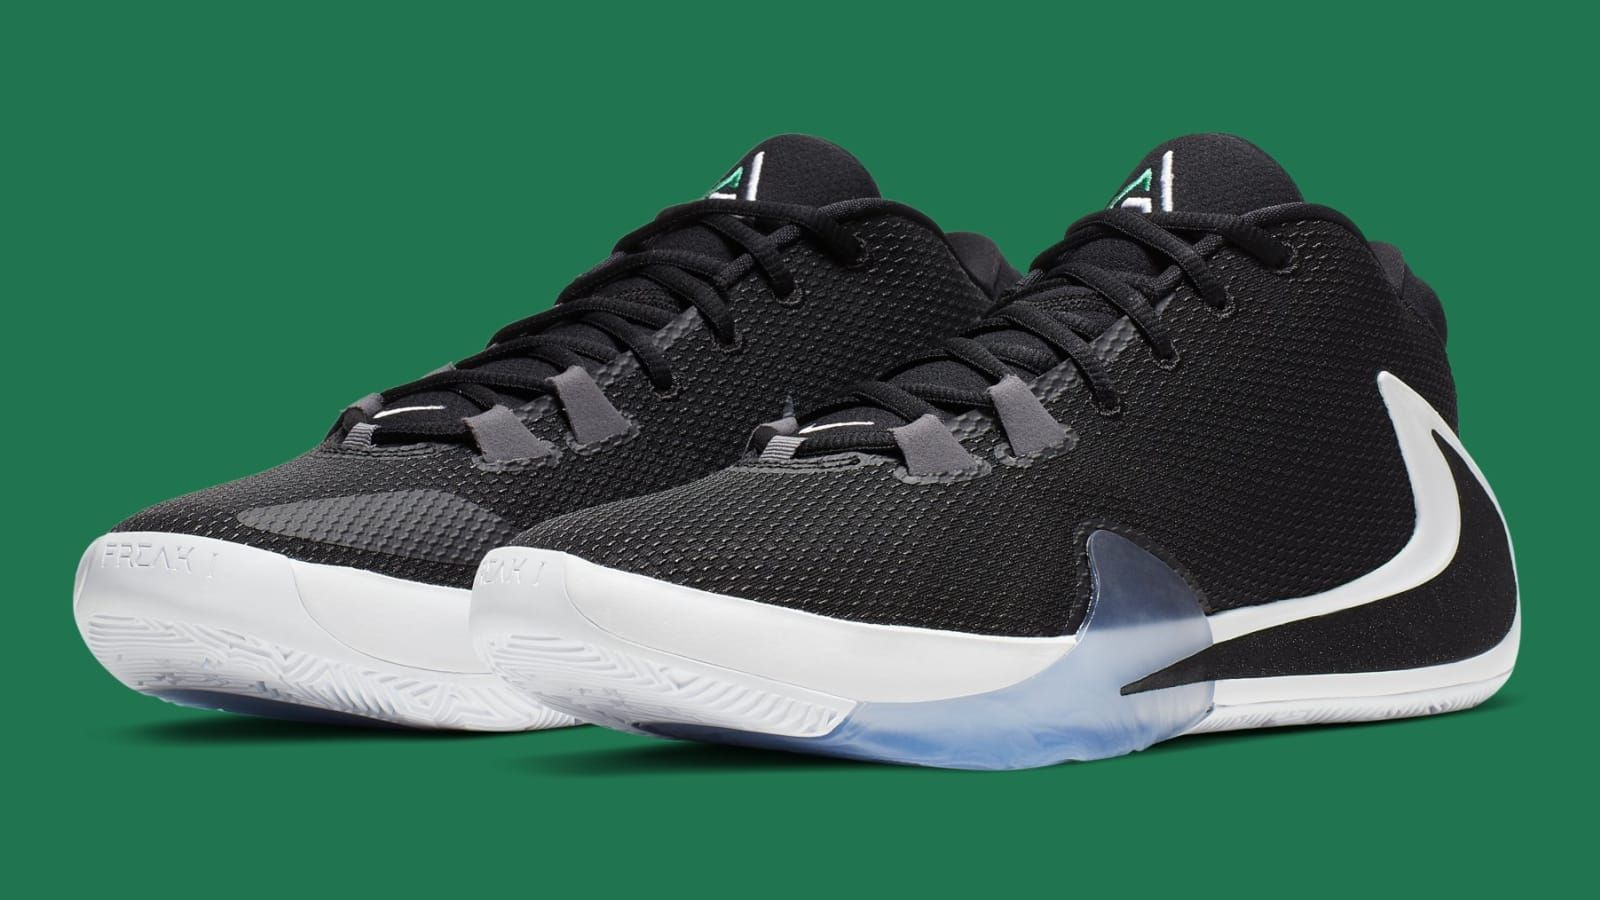 Nike basketball shoes, Nike zoom, Nike